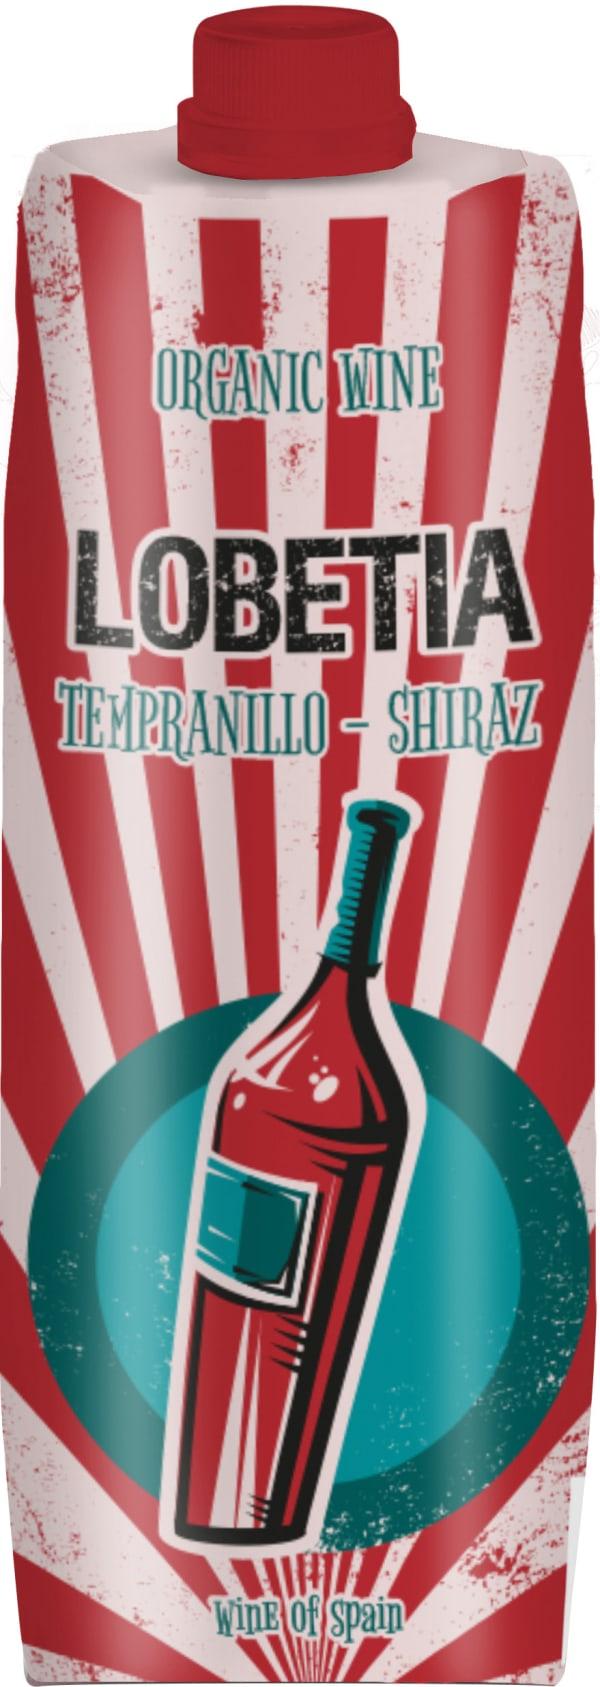 Lobetia Tempranillo Shiraz 2018 kartongförpackning